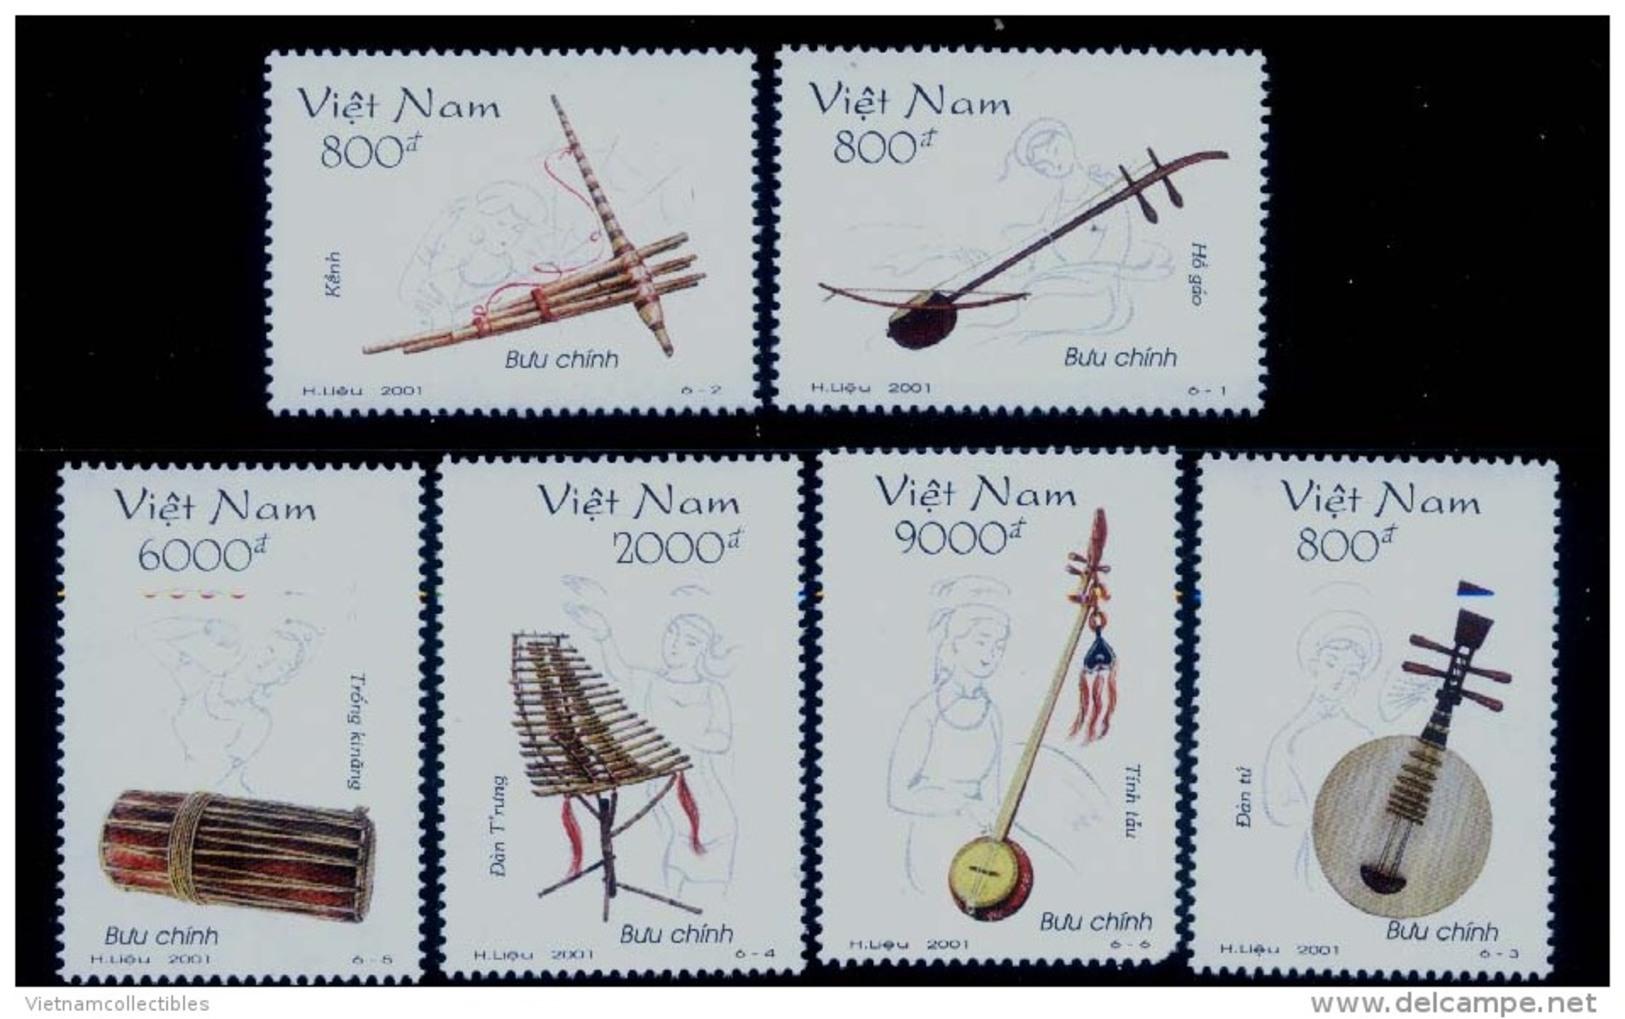 Vietnam Viet Nam MNH Perf Withdrawn Stamps 2001 : Vietnamese Traditional Musical Instruments / Music (Ms870) - Vietnam